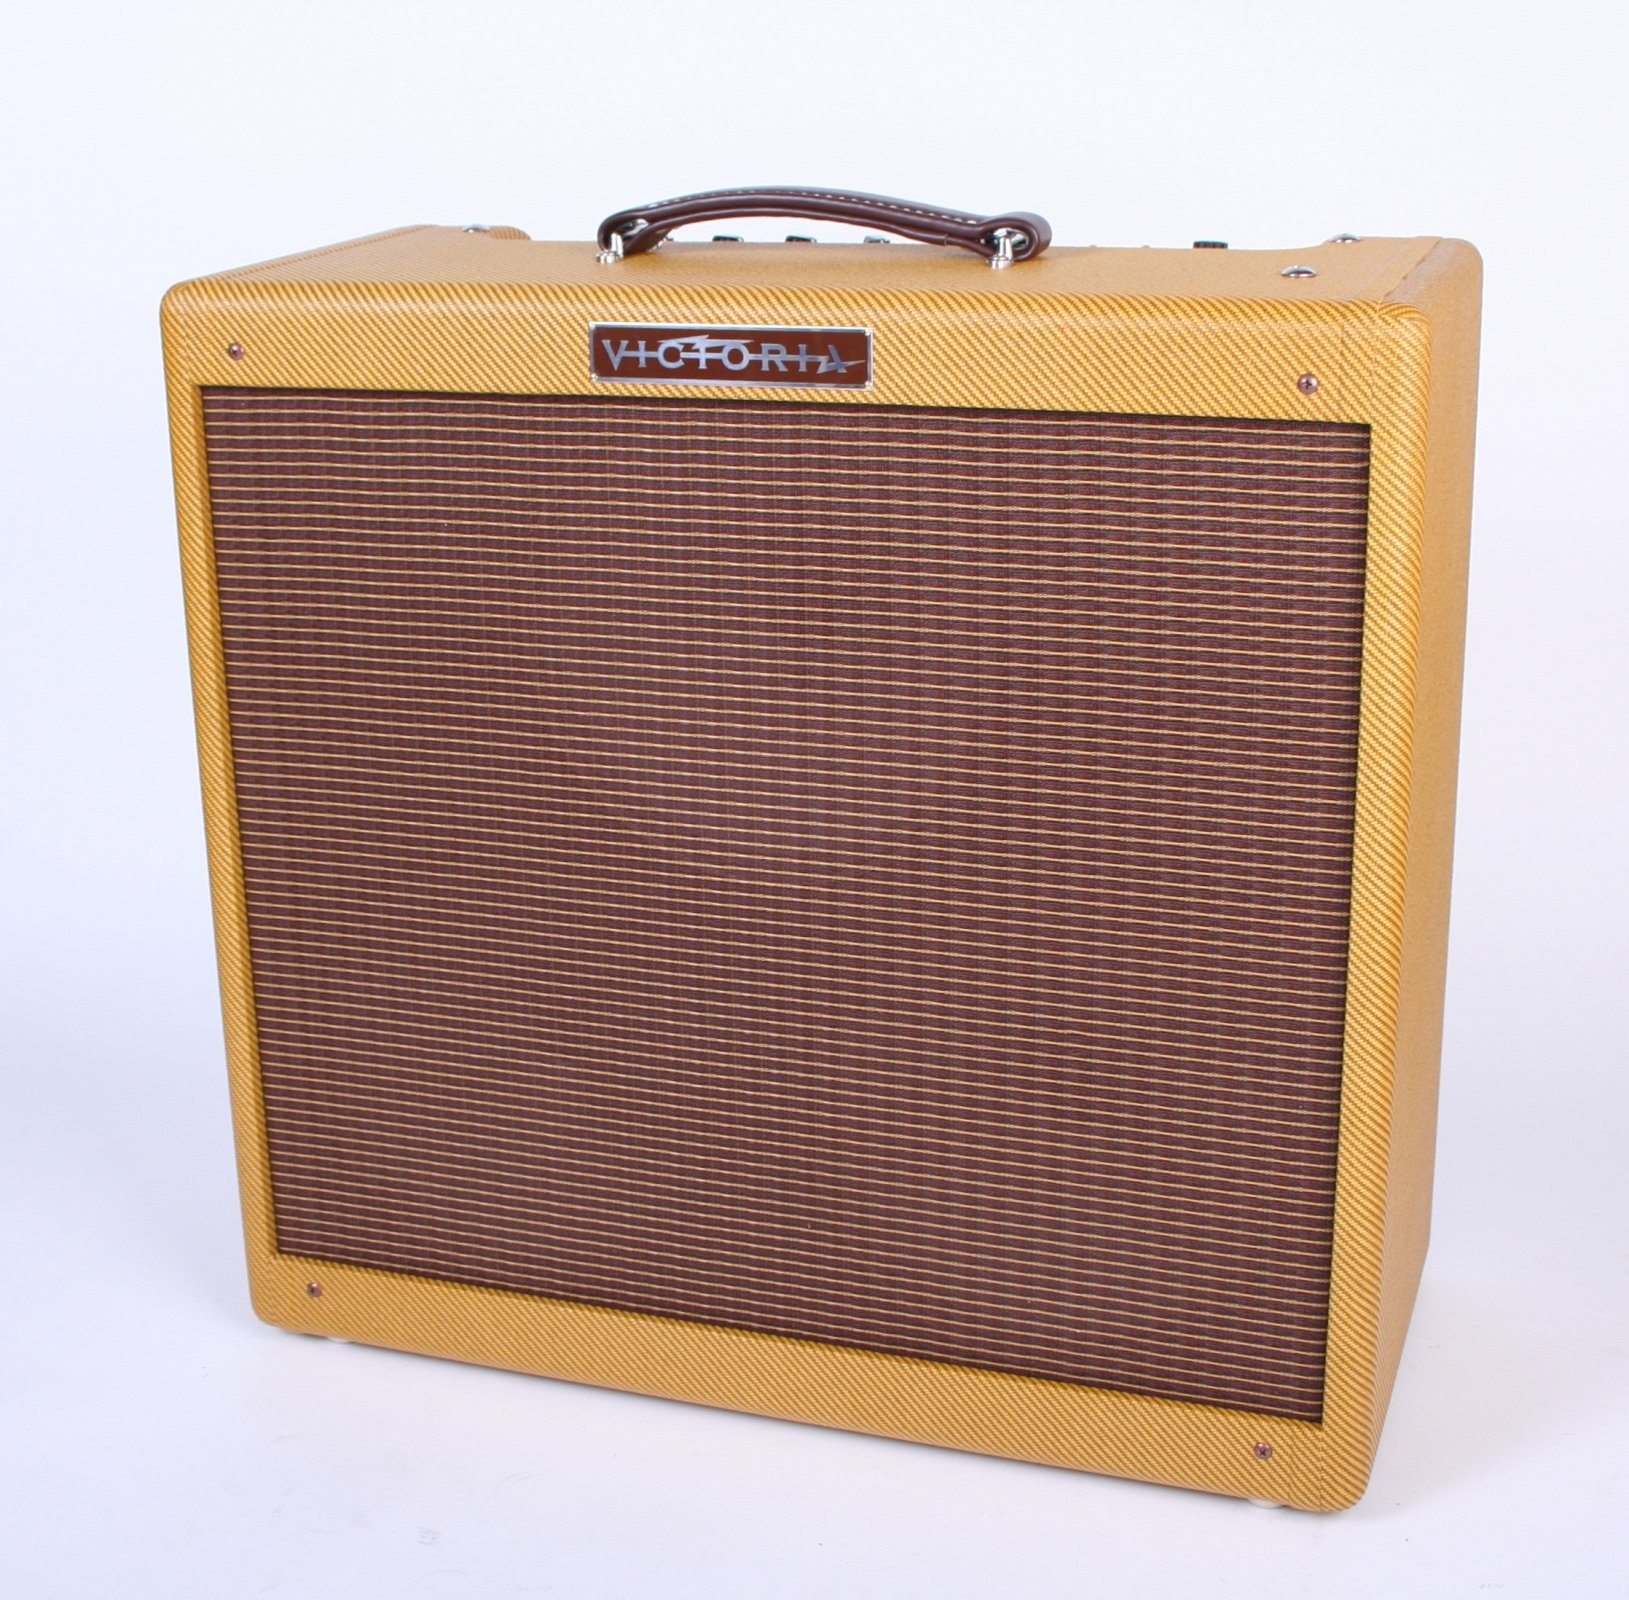 Victoria Amplifier Co 35310 5E7-A Style